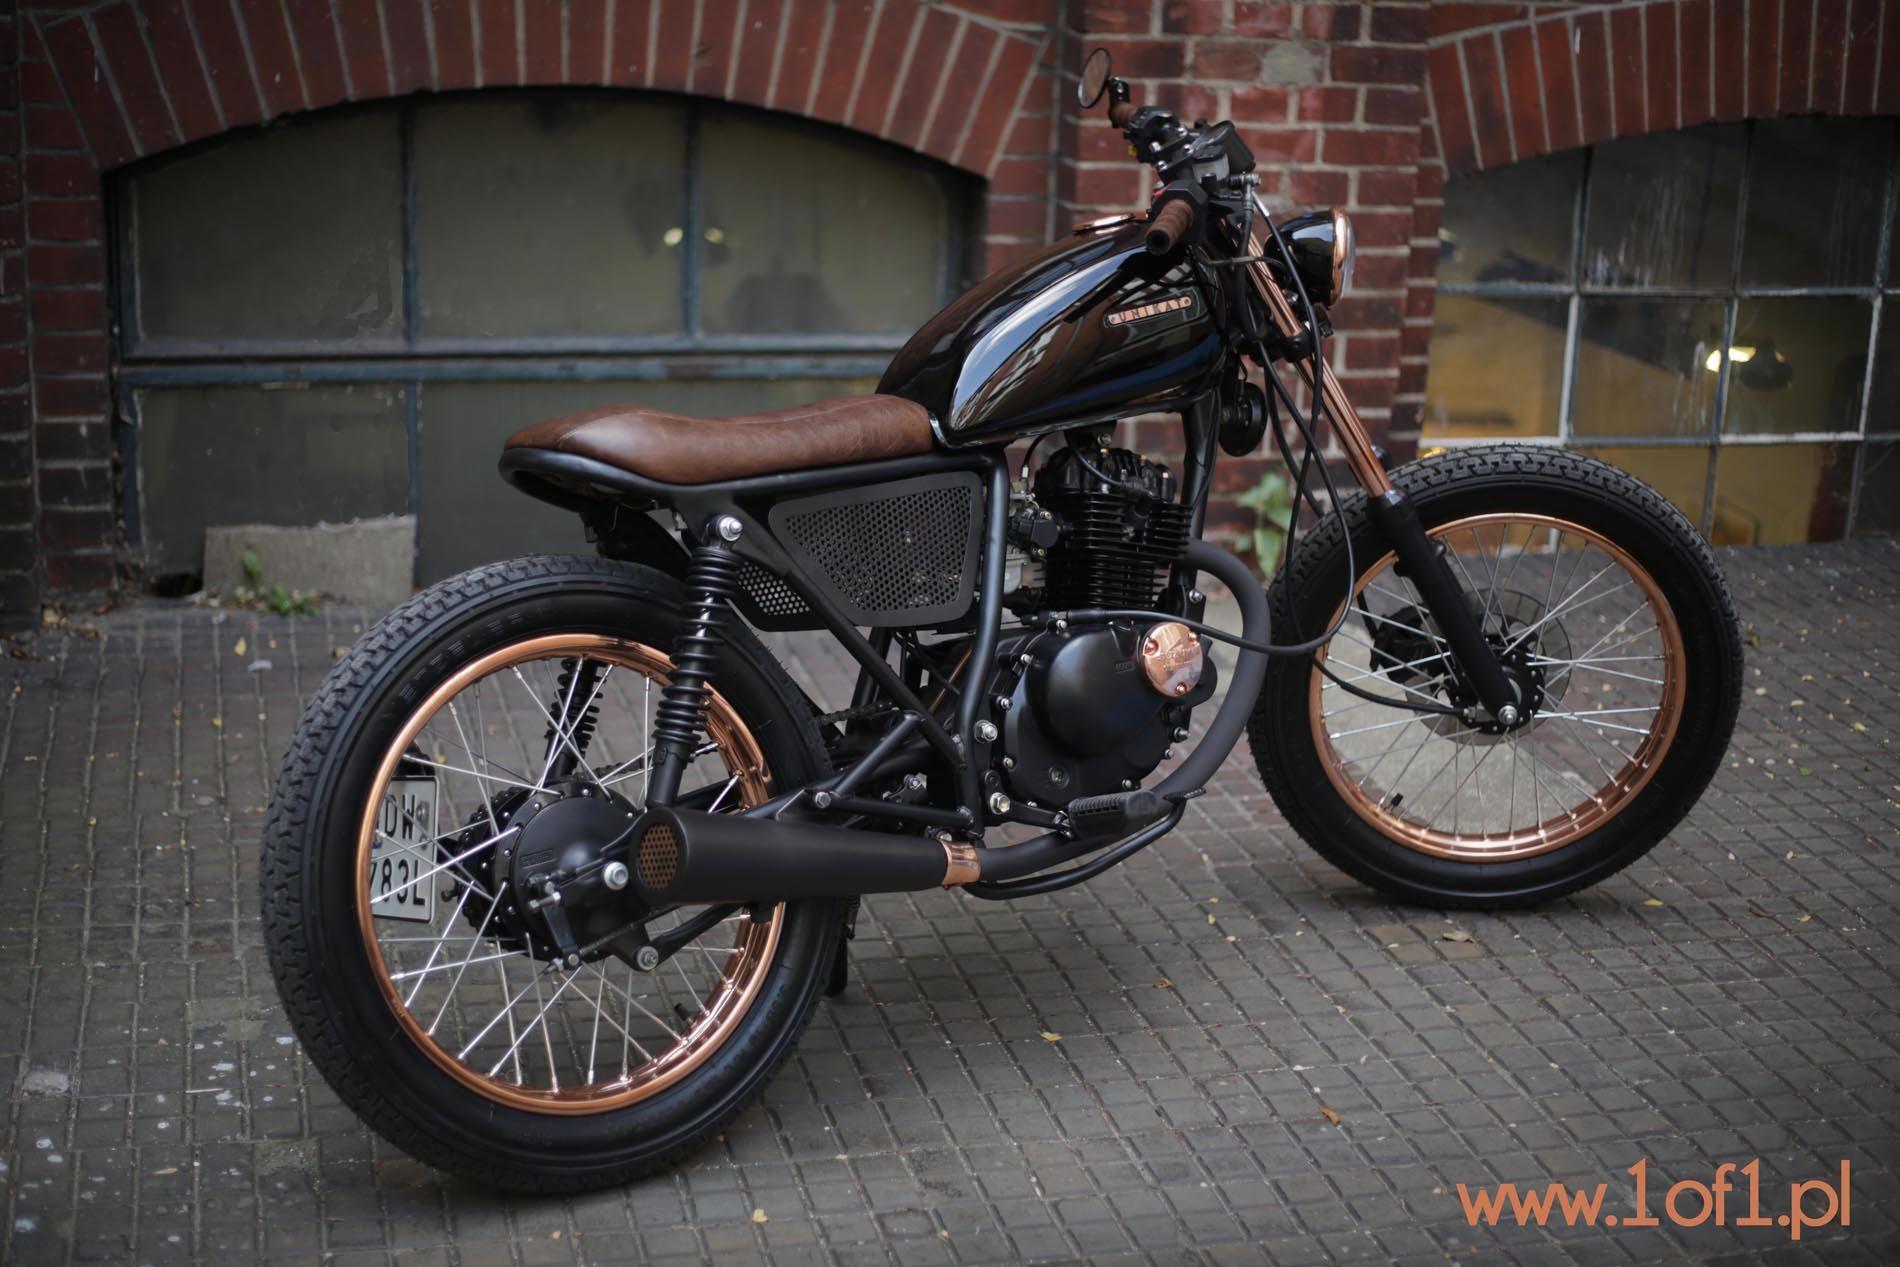 unikat suzuki gn 125 custom motorcycles pinterest. Black Bedroom Furniture Sets. Home Design Ideas